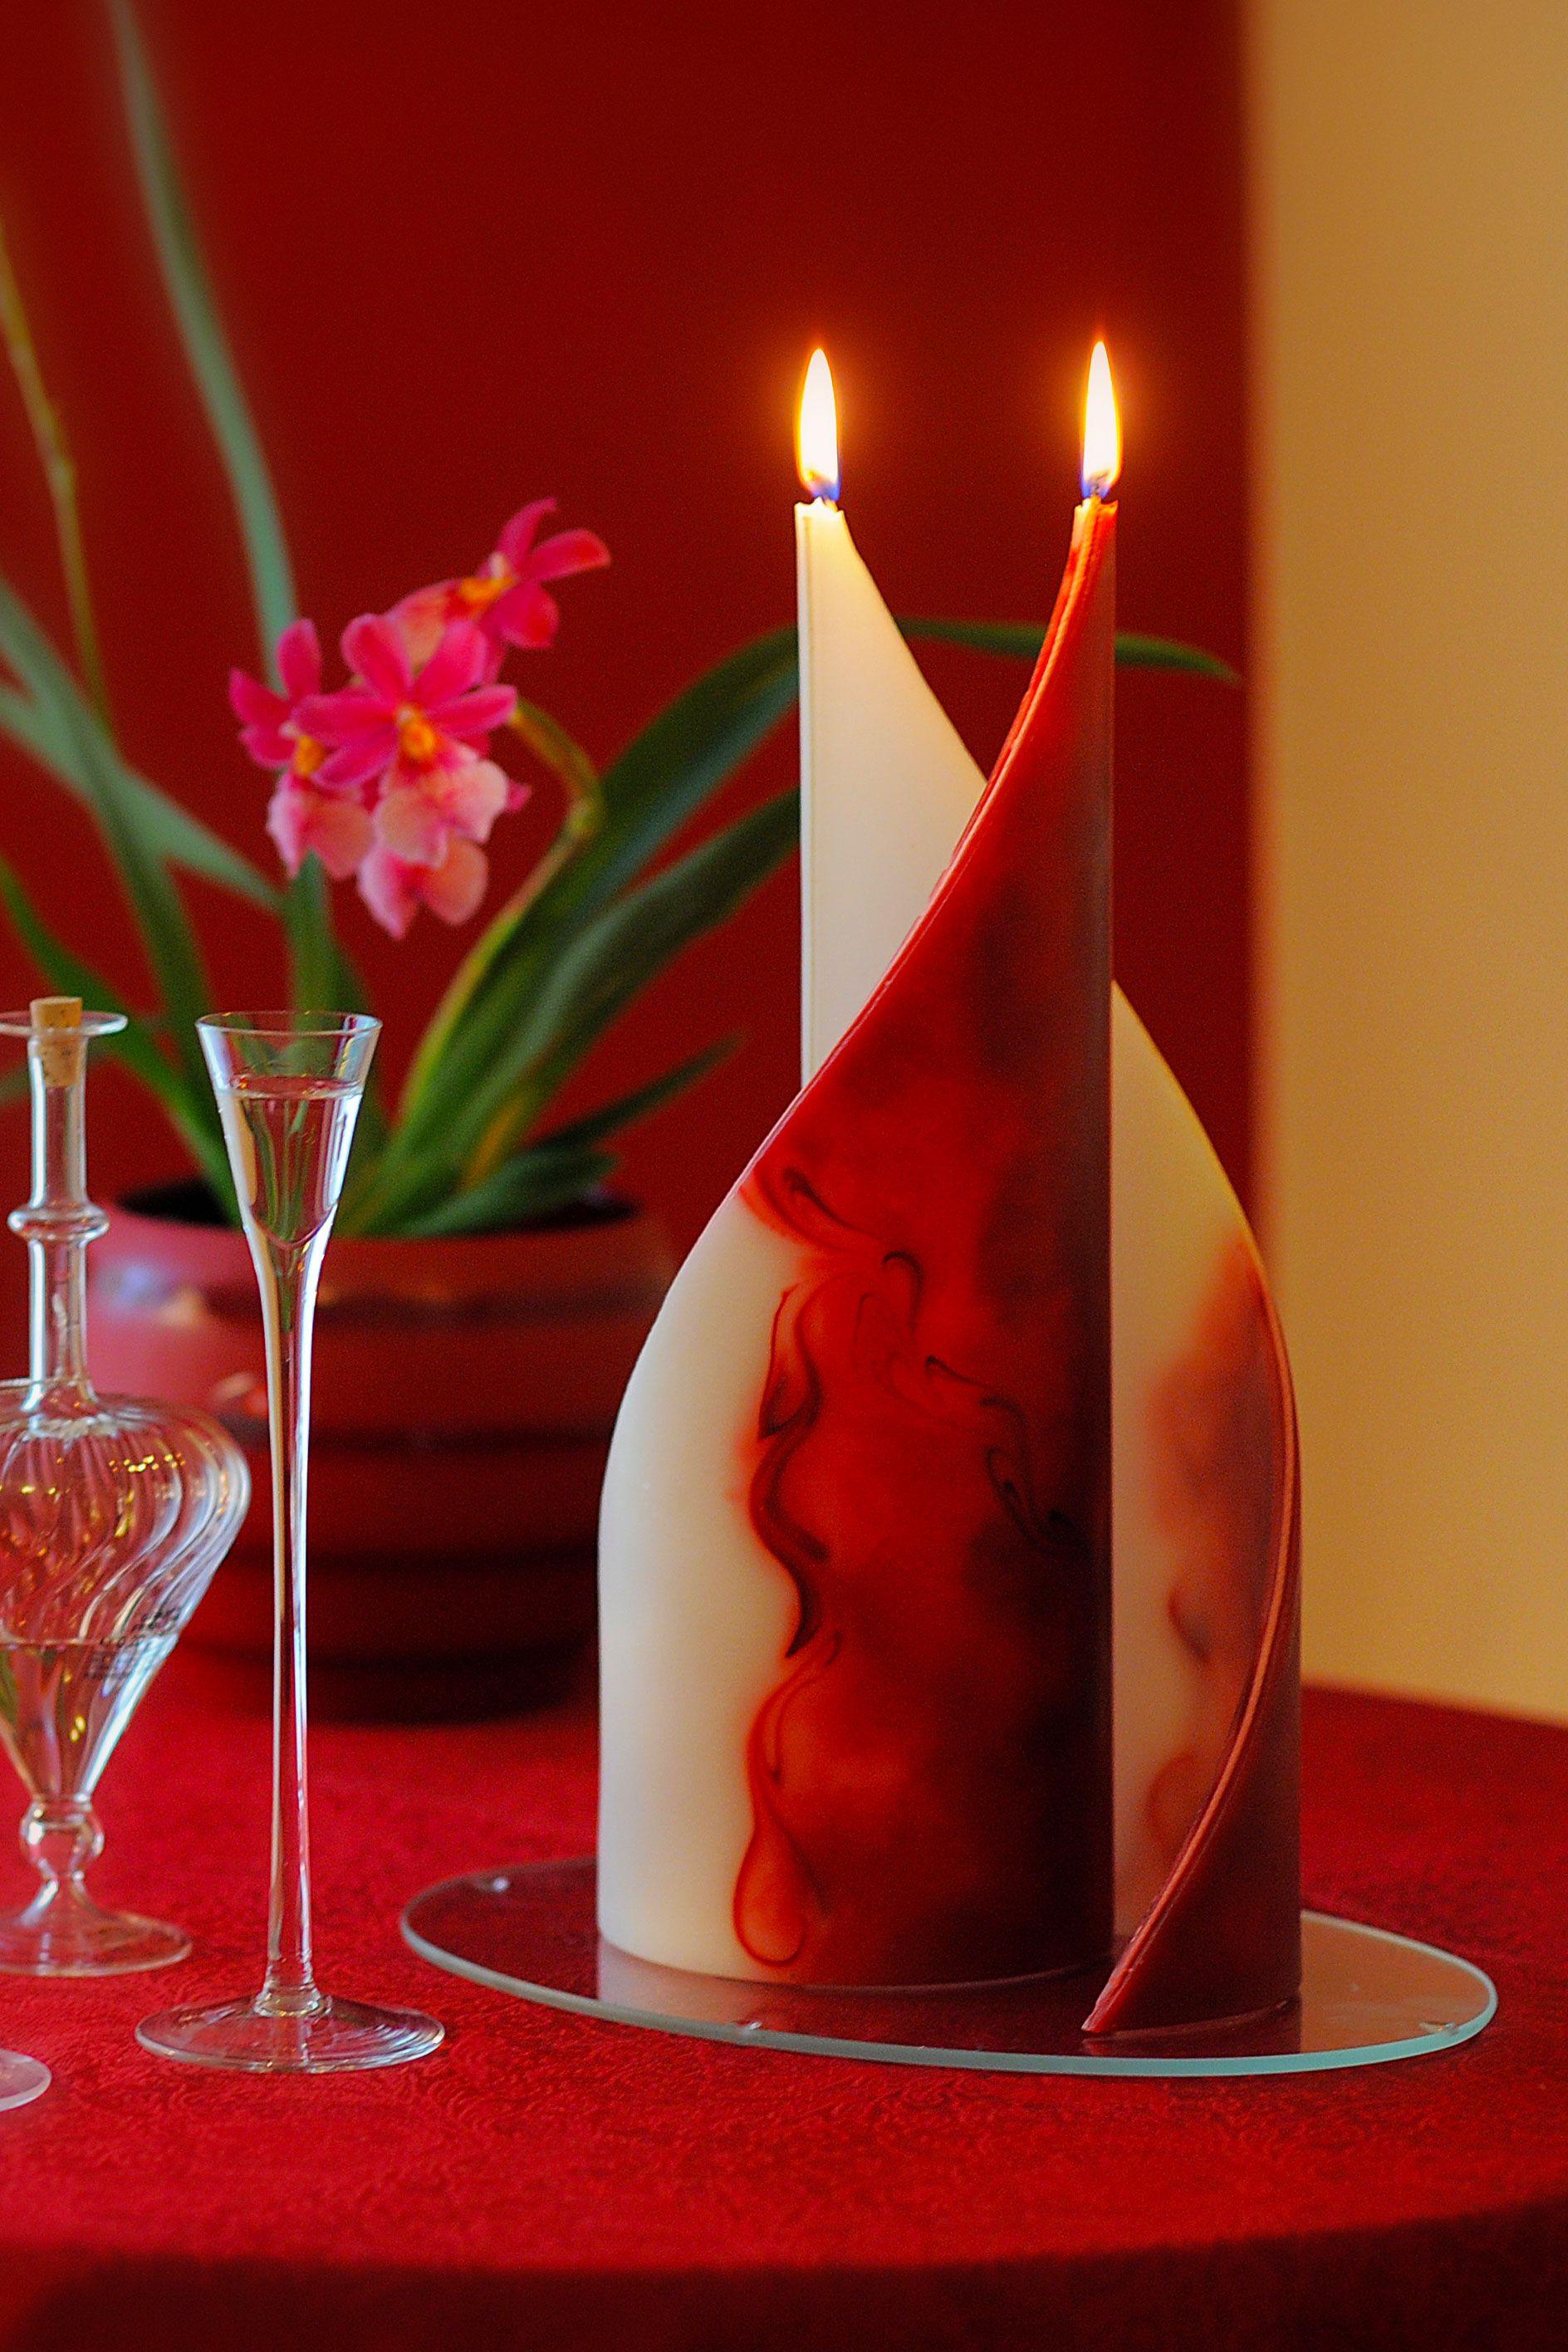 Segelkerzen Von Elem Candle Candles Candles Crafts Candle Carving